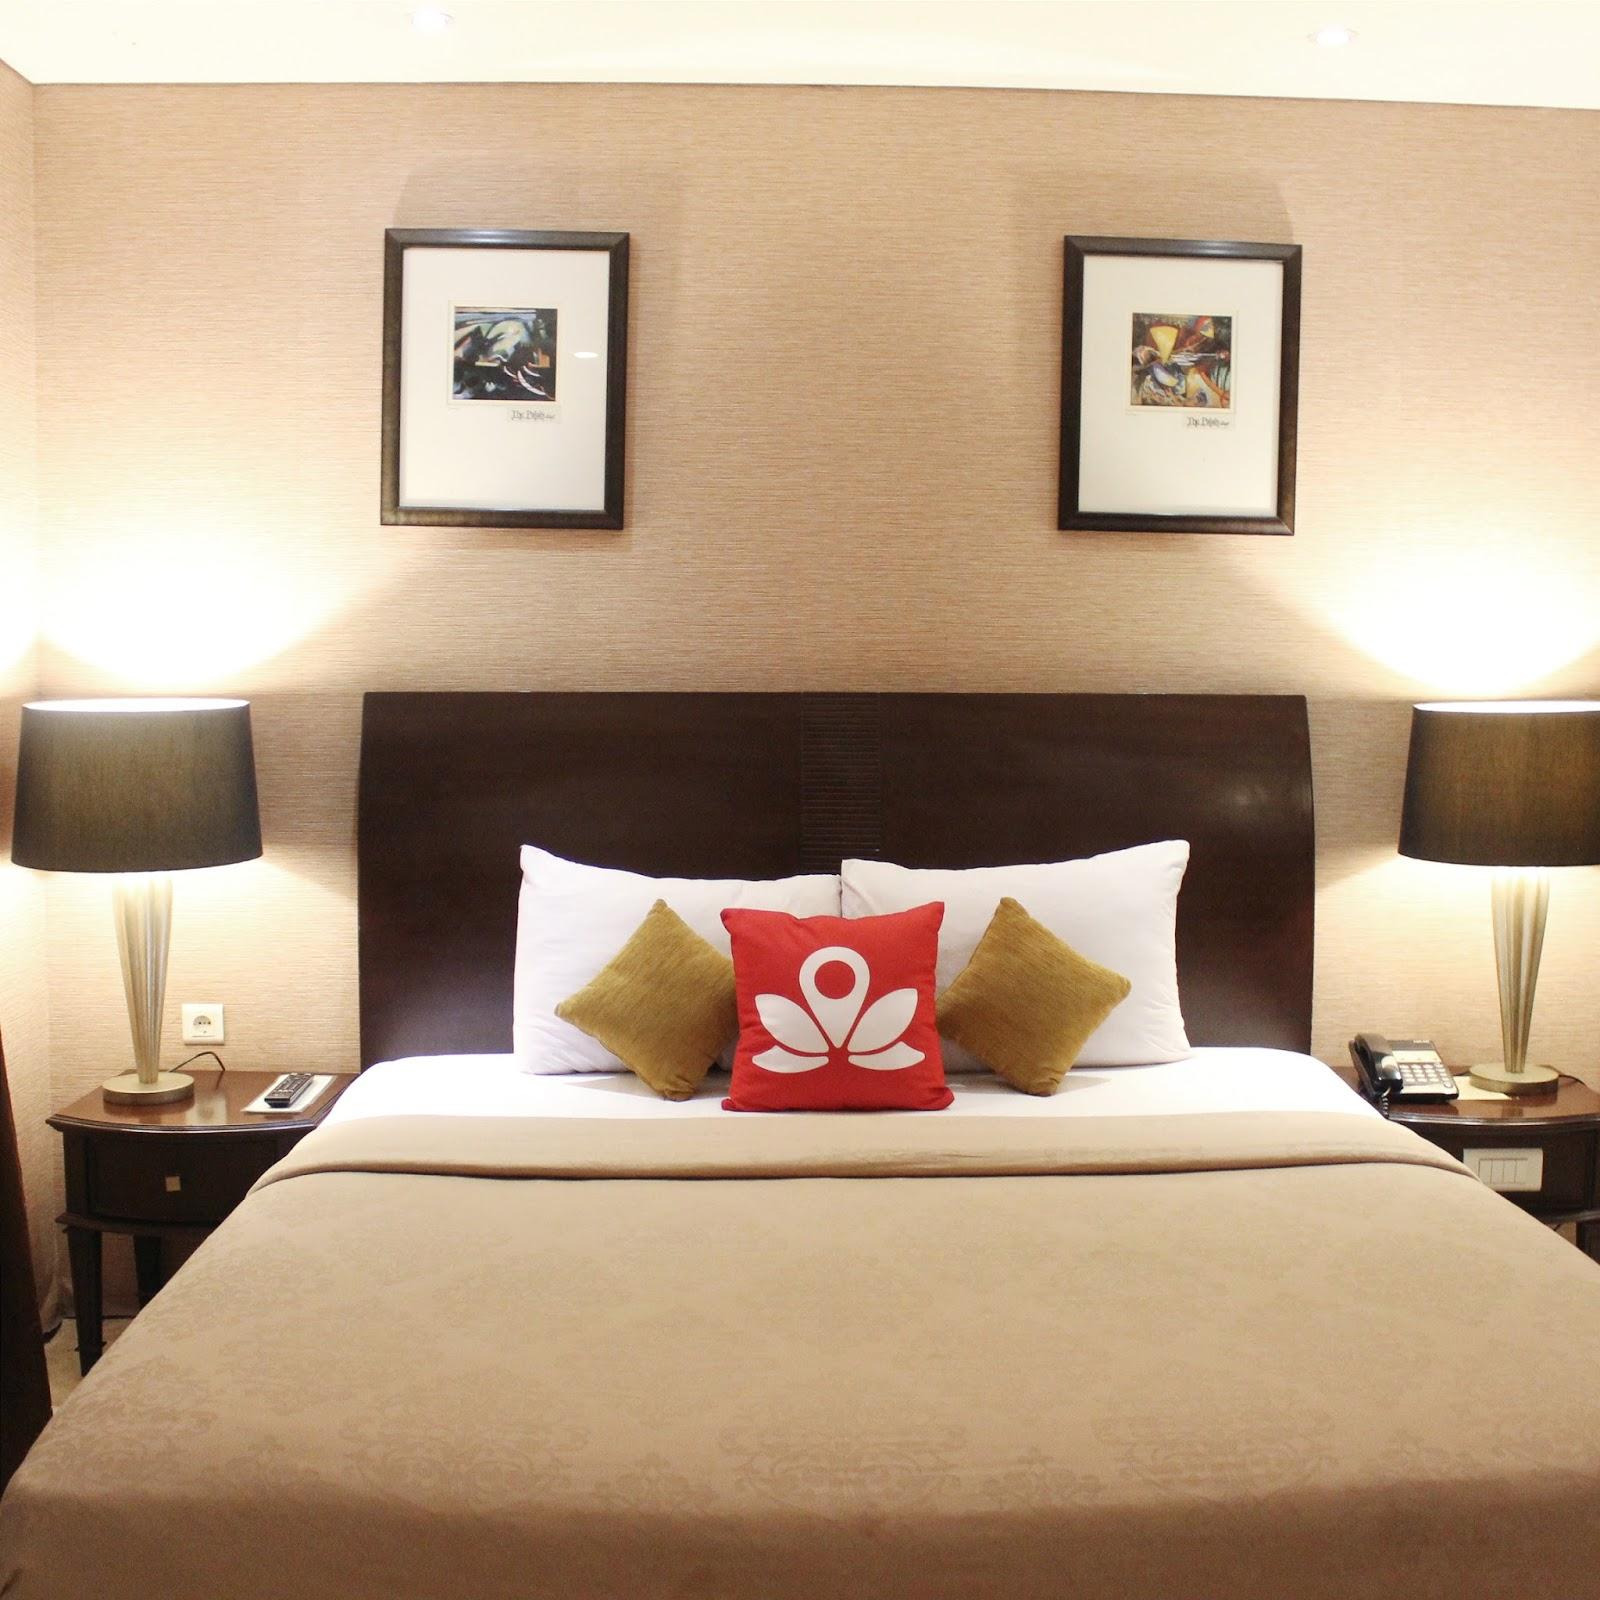 Boutique Hotel Room Furniture